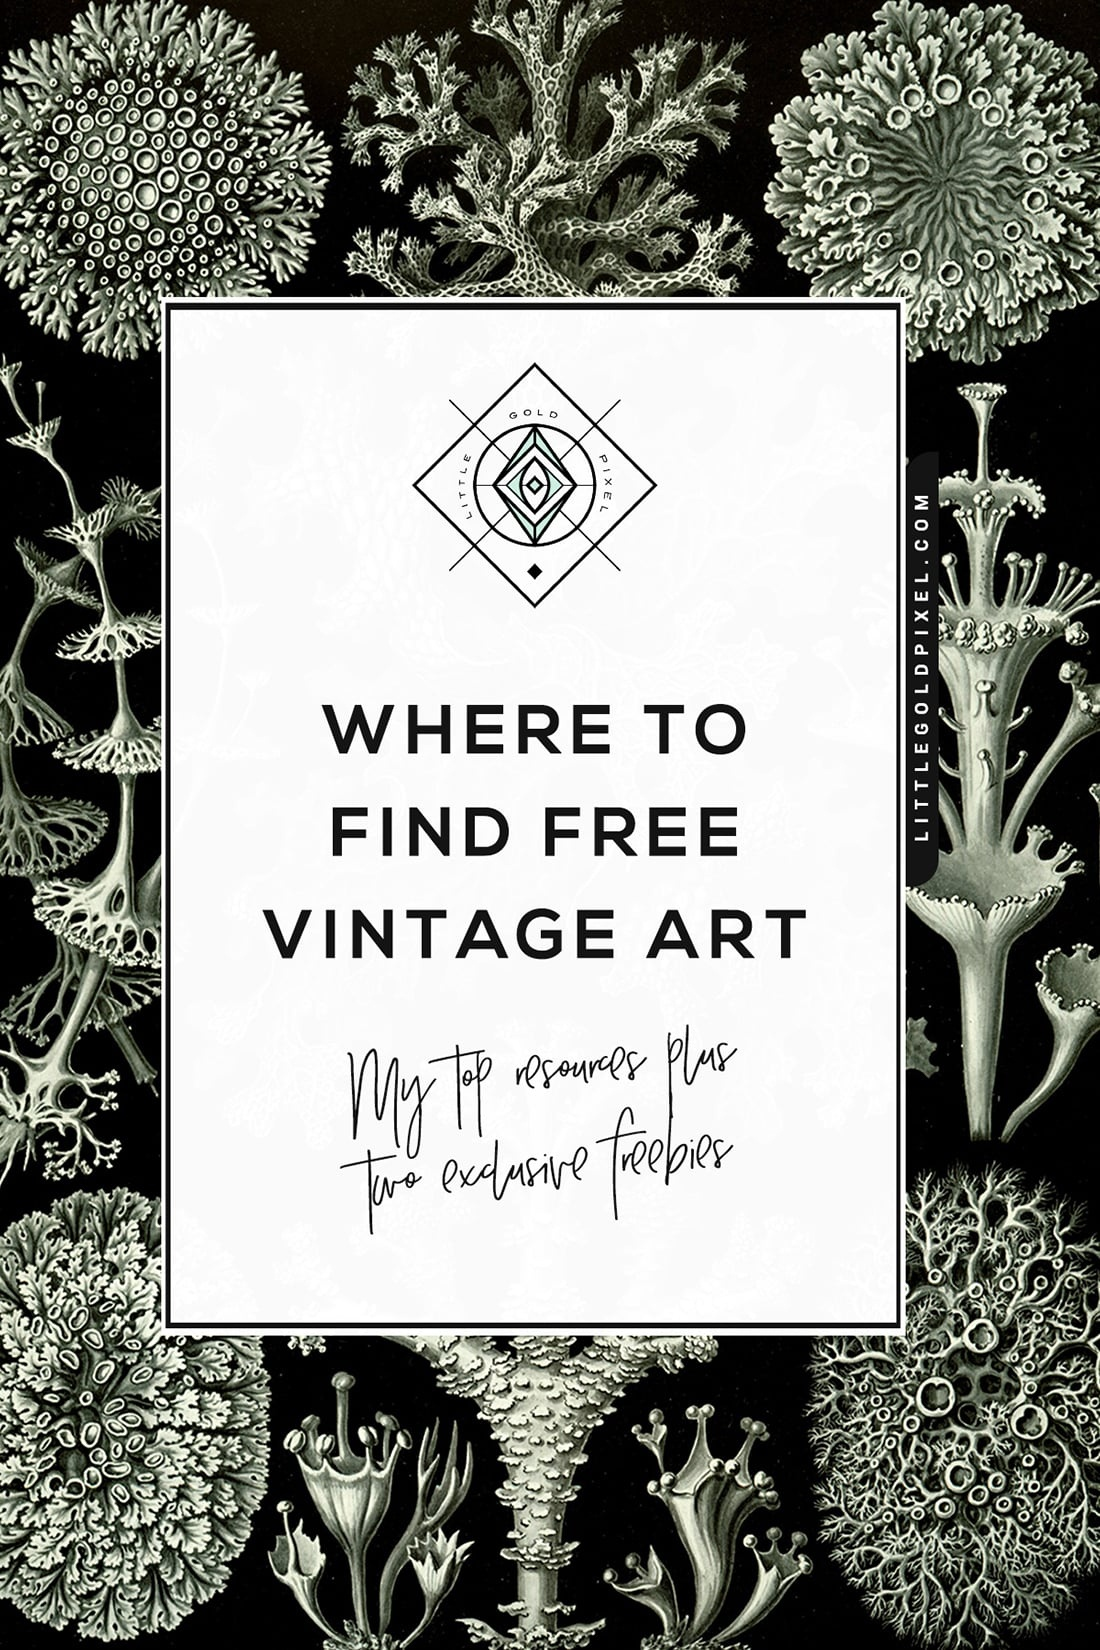 Free Vintage Art • Where To Find It + Exclusive Freebies • Little - Free Printable Vintage Art